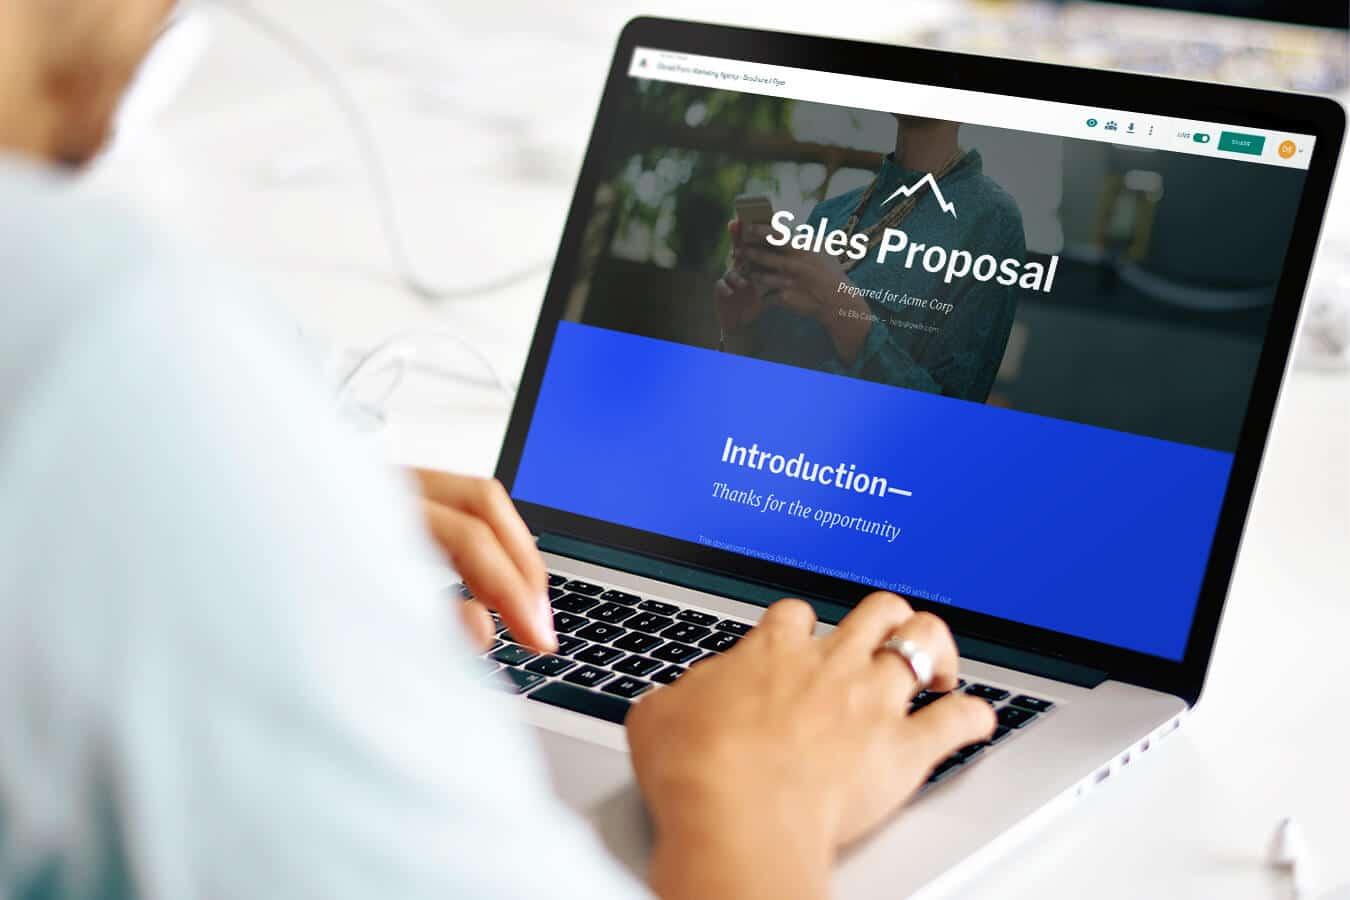 sales-proposal-laptop